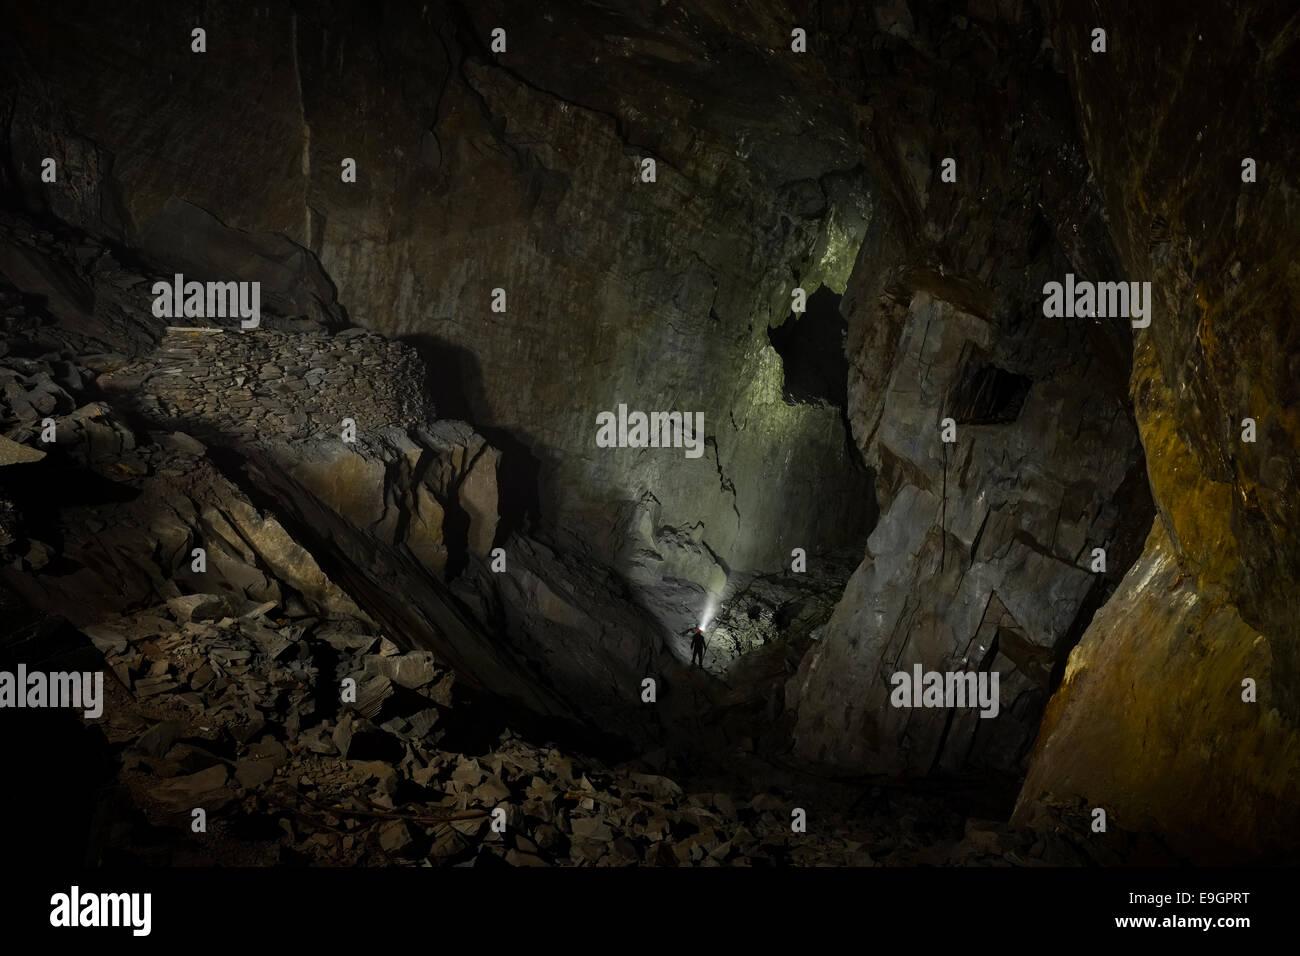 Exploring Moss Head slate mine, Coniston, Cumbria UK - Stock Image